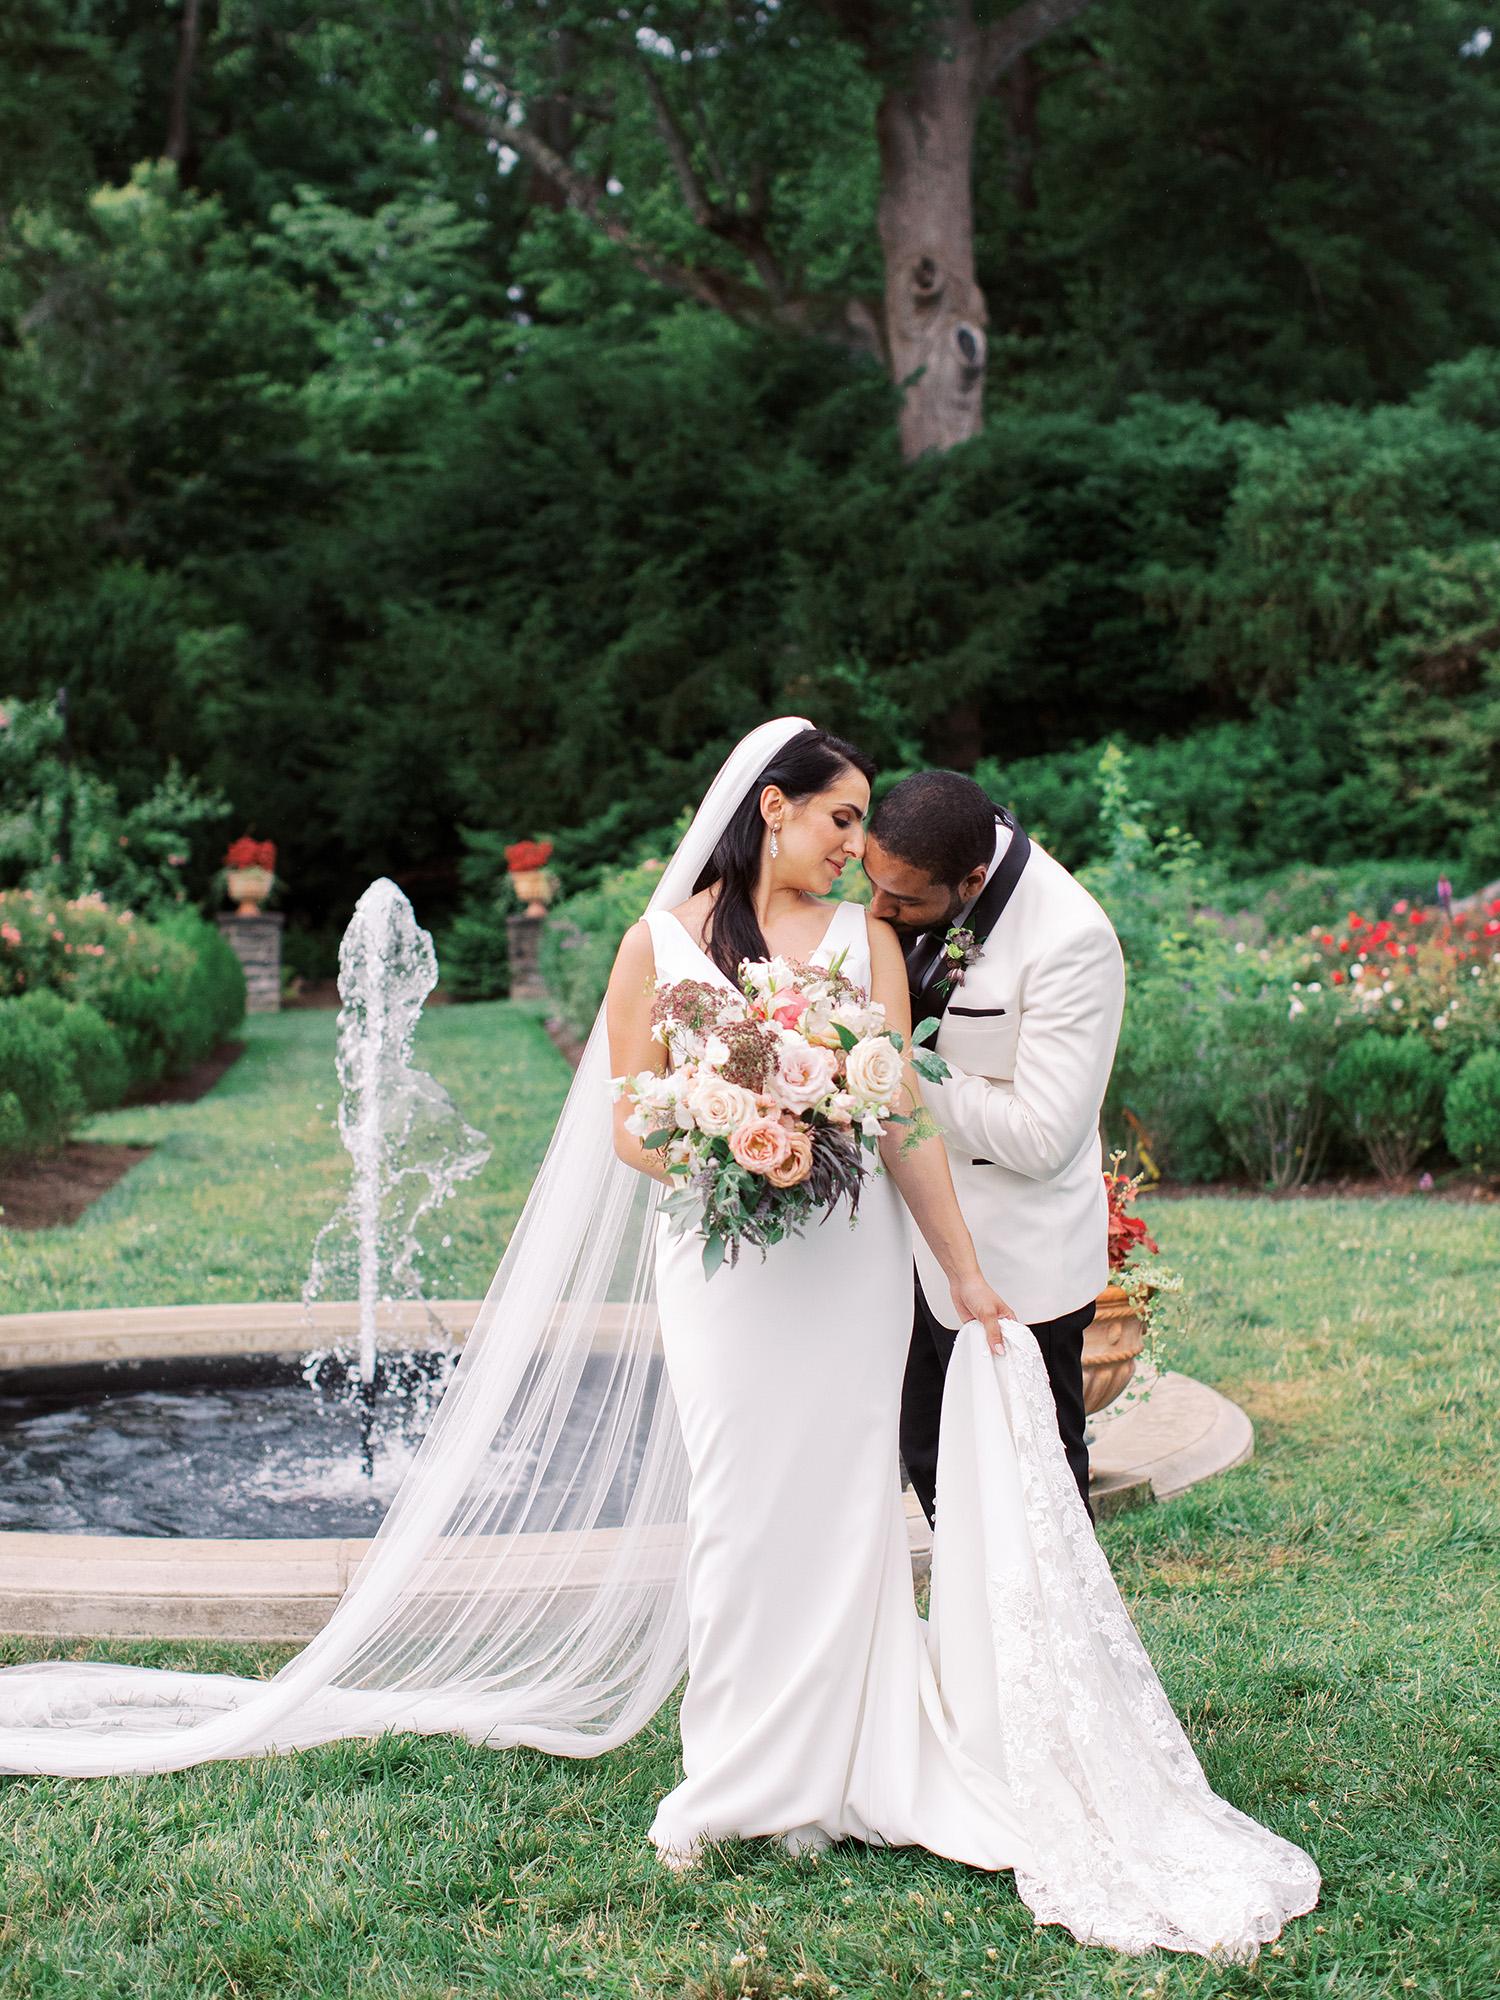 noel mike wedding couple shoulder kiss